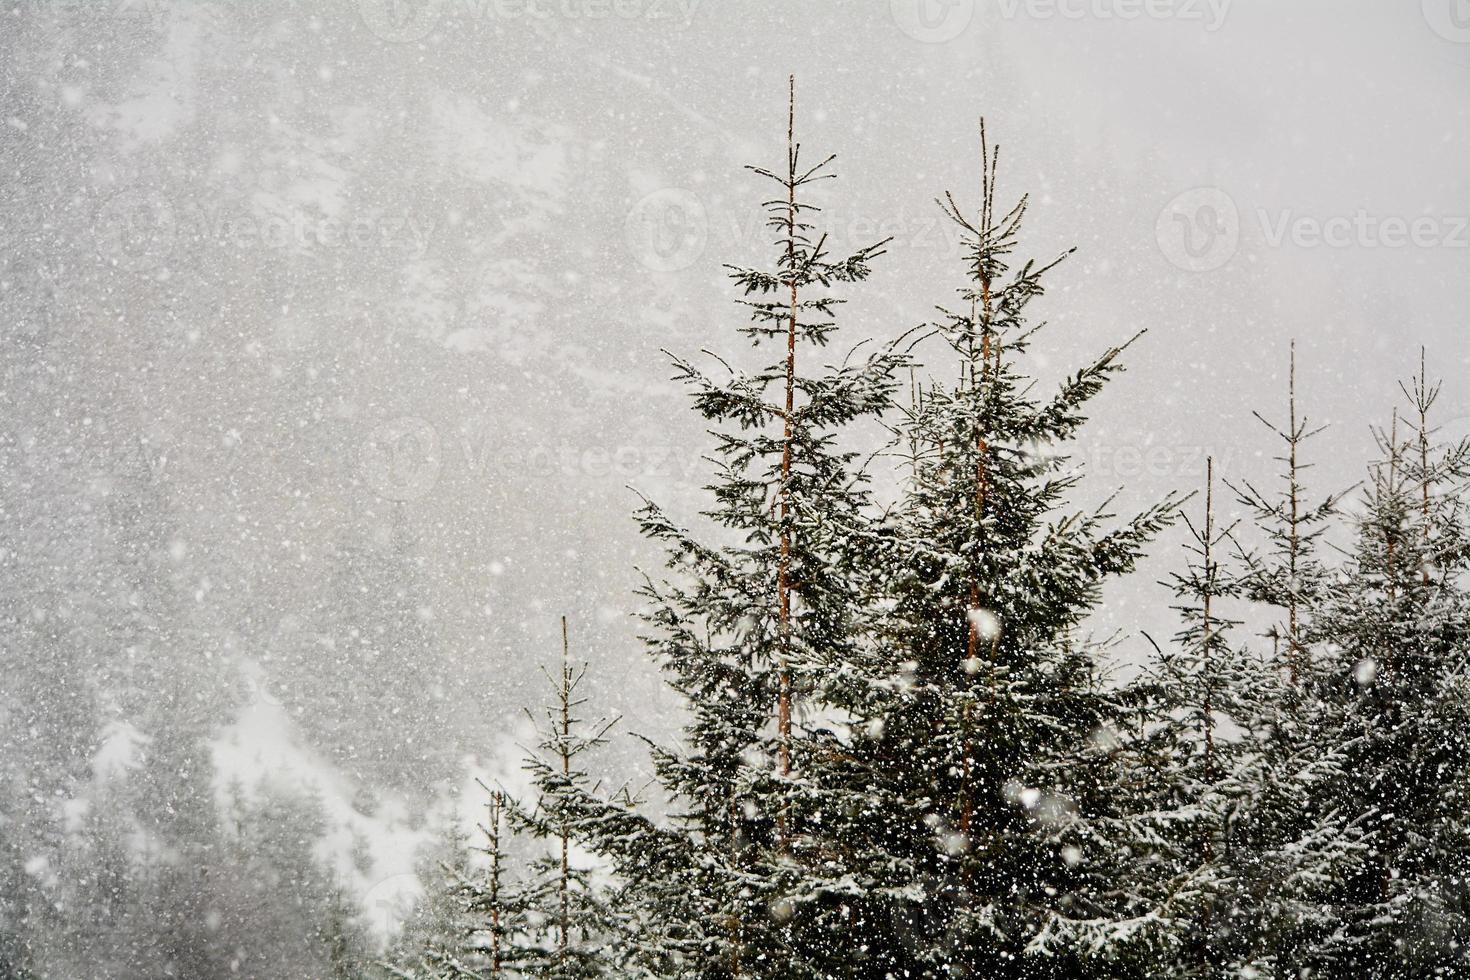 snowfall in winter photo